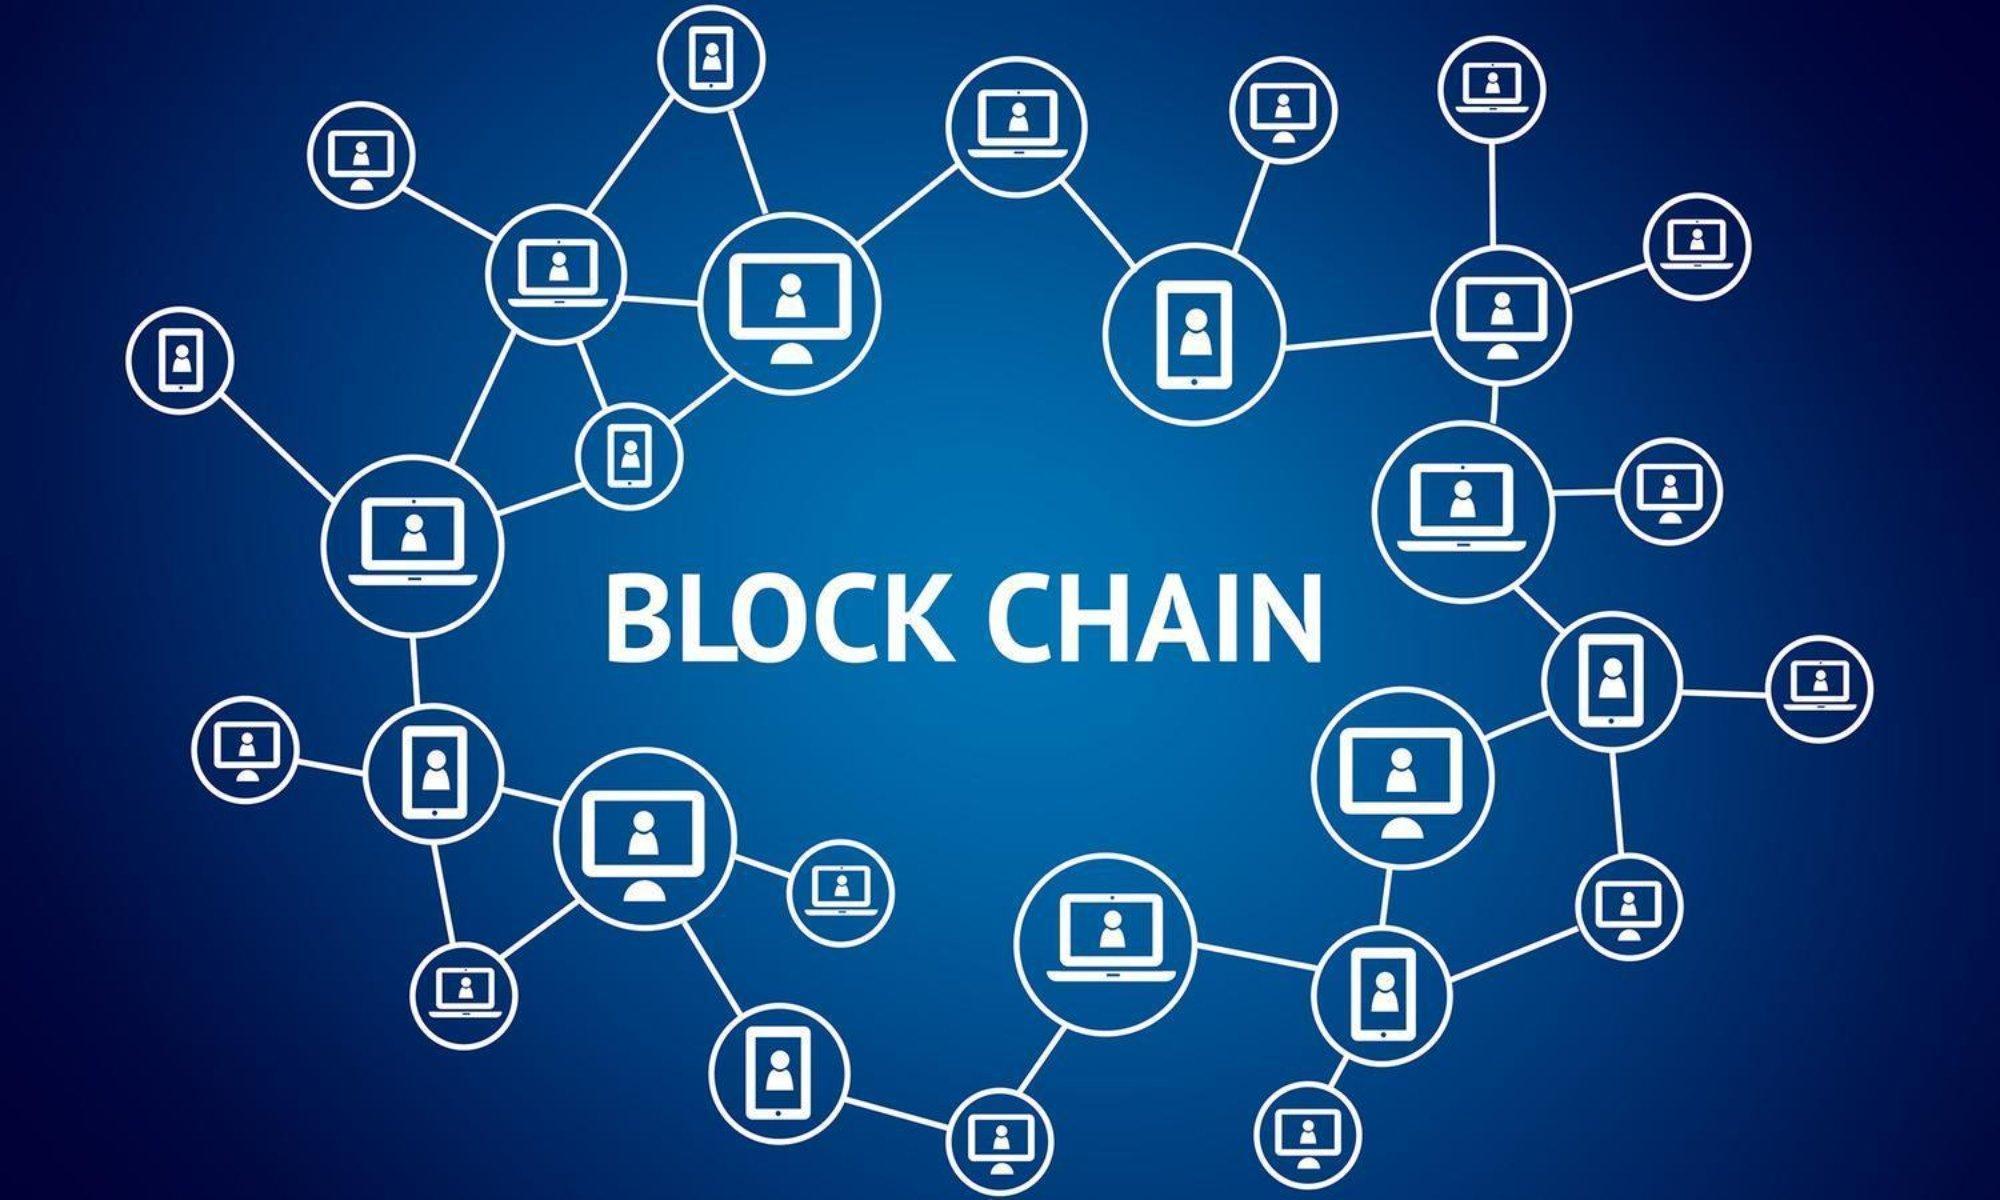 Ankara Blockchain Bootcamp | Blockchain Training | Bitcoin Training | IT Training | Ethereum | Solidity | Hyperledger | Distributed Ledger | Smart Contracts | Cryptocurrency | Cryptocurrencies Etkinlik Afişi